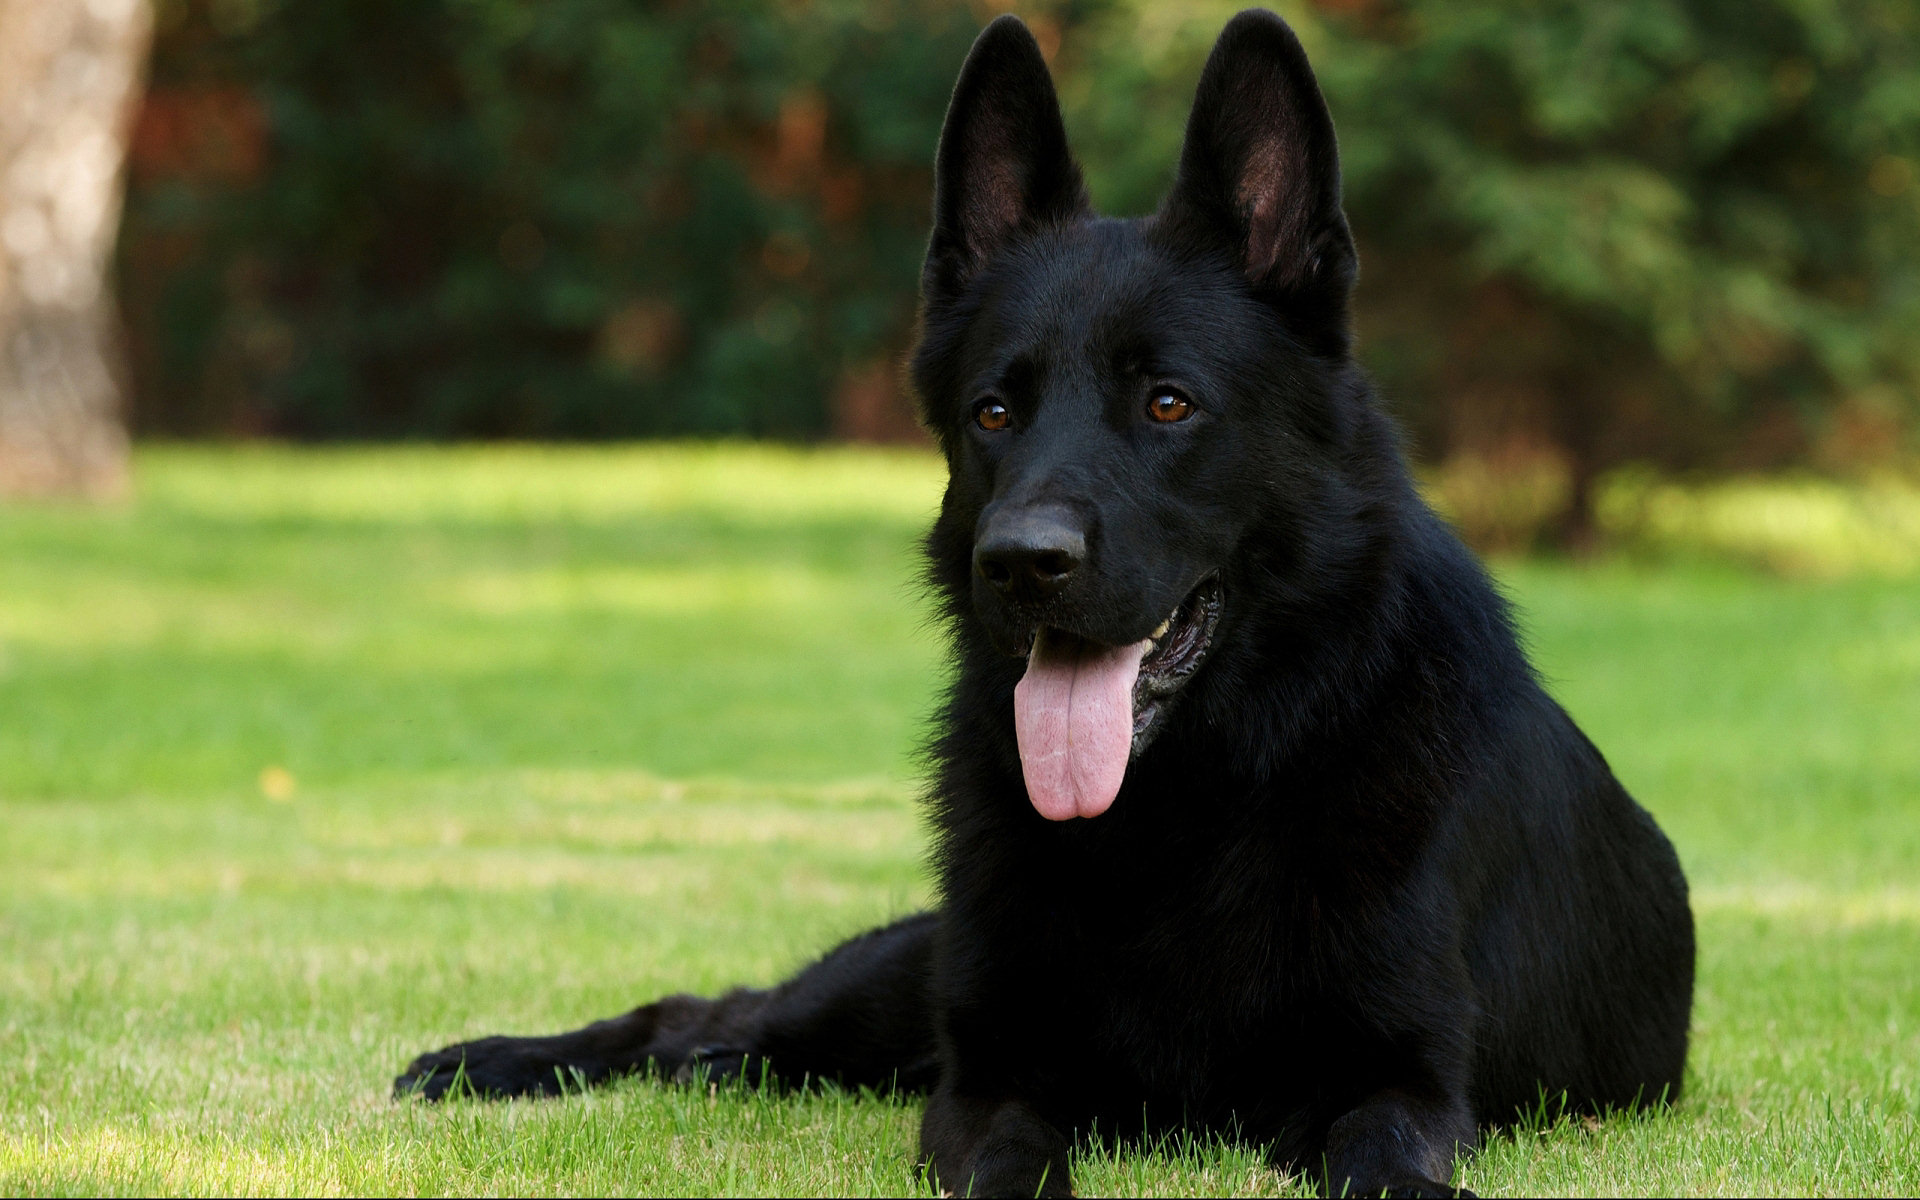 Rüyada Oynayan Siyah Köpek Sevmek